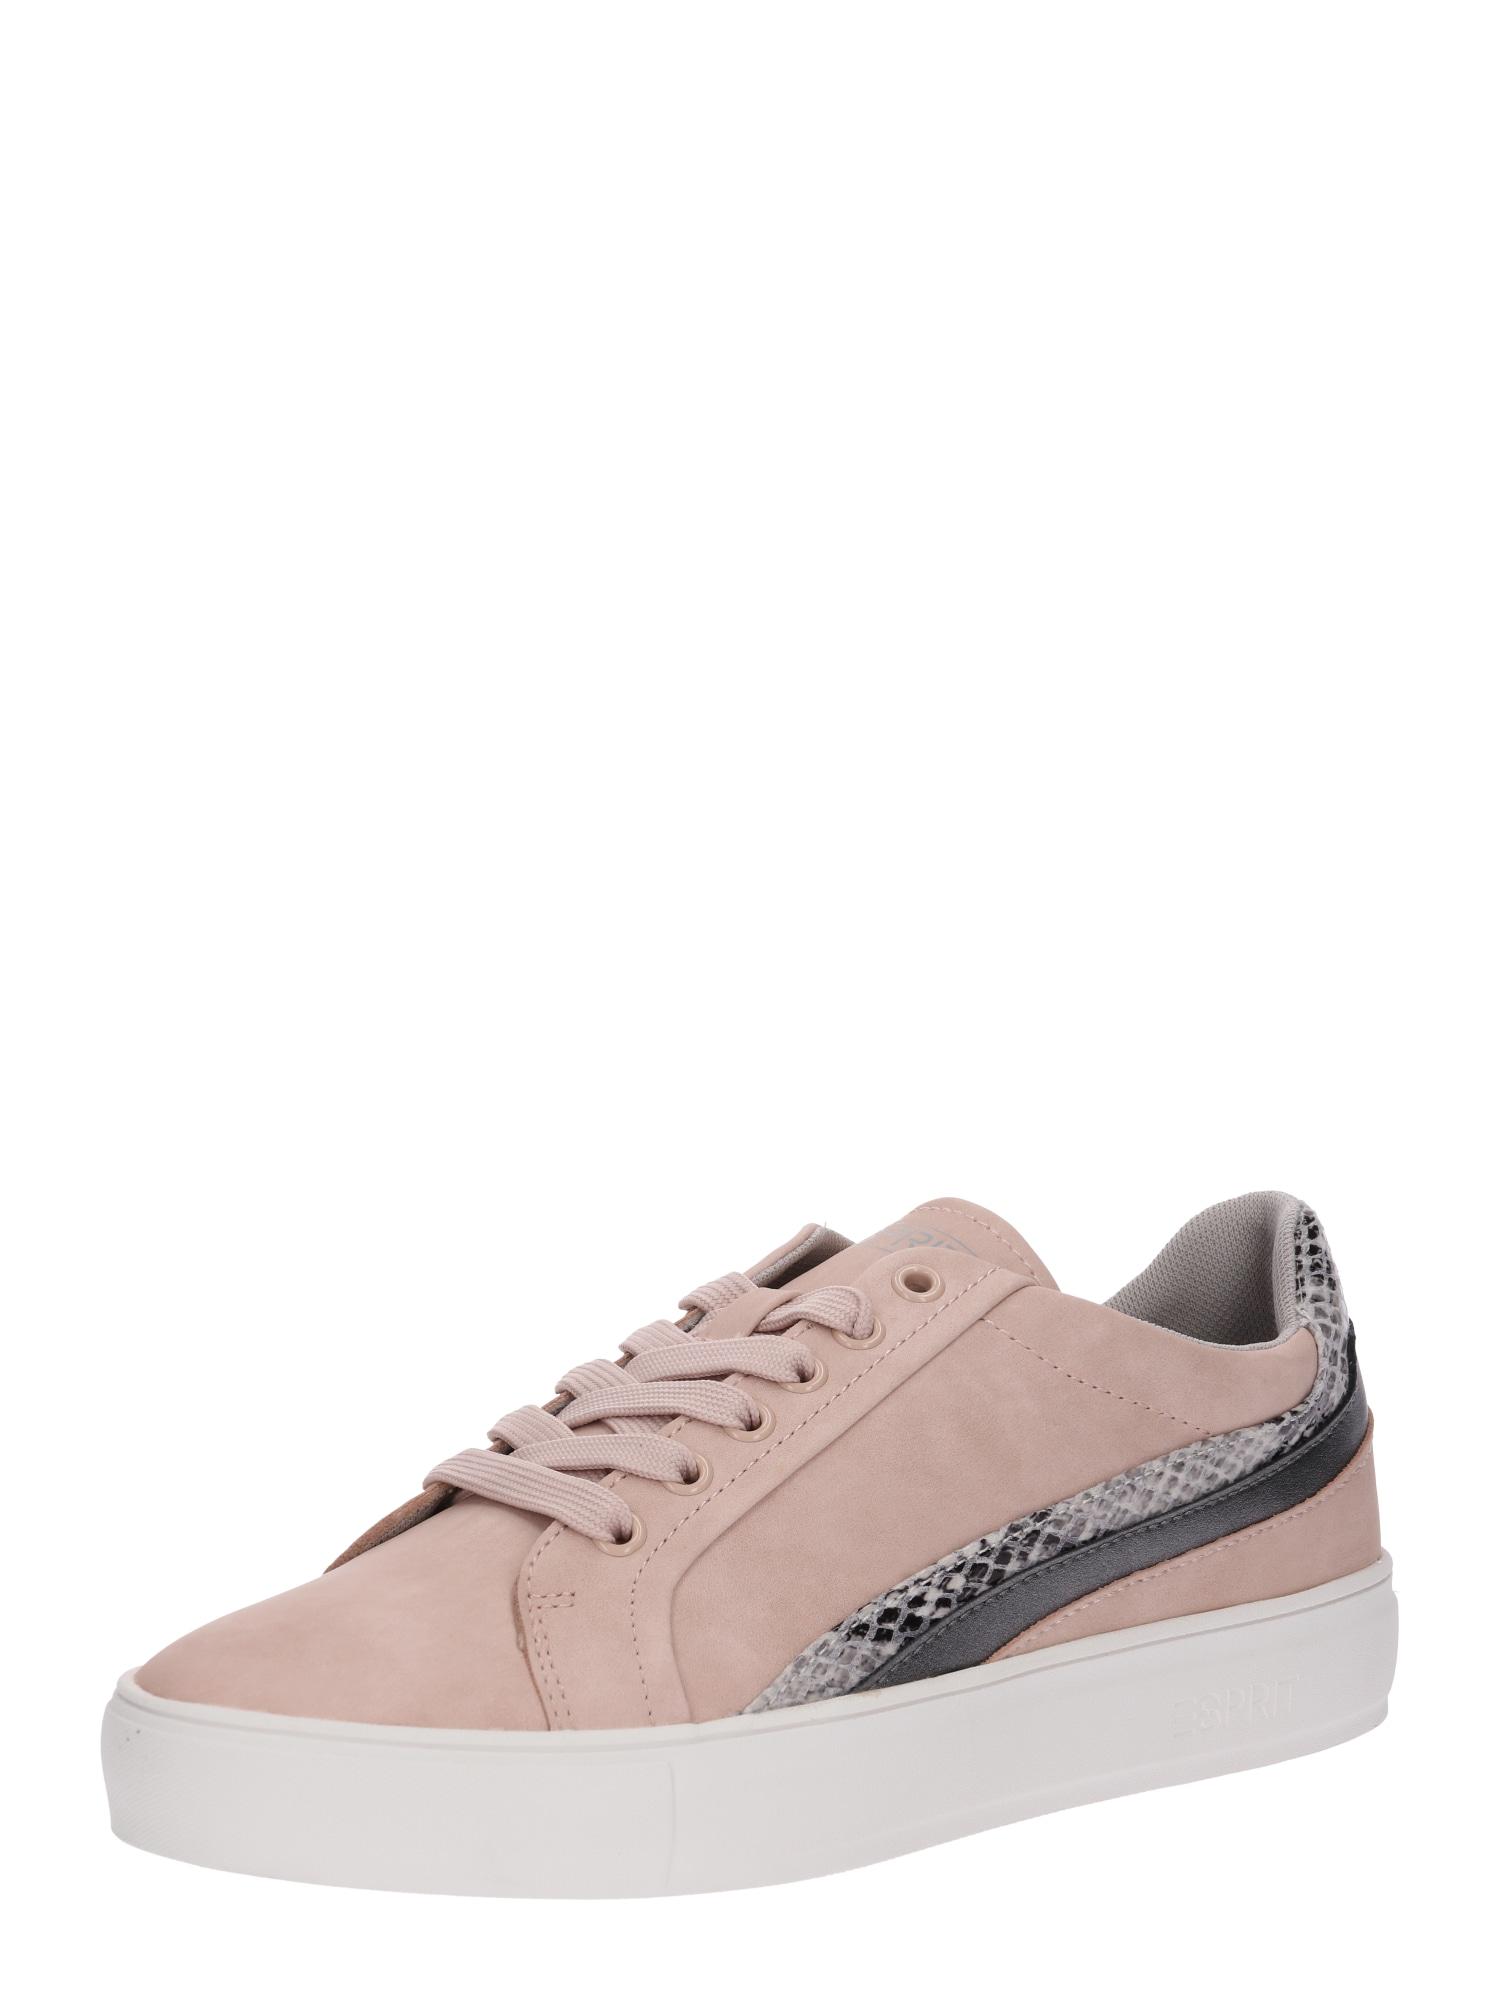 Tenisky Colette LU Casual Shoes  růžová ESPRIT